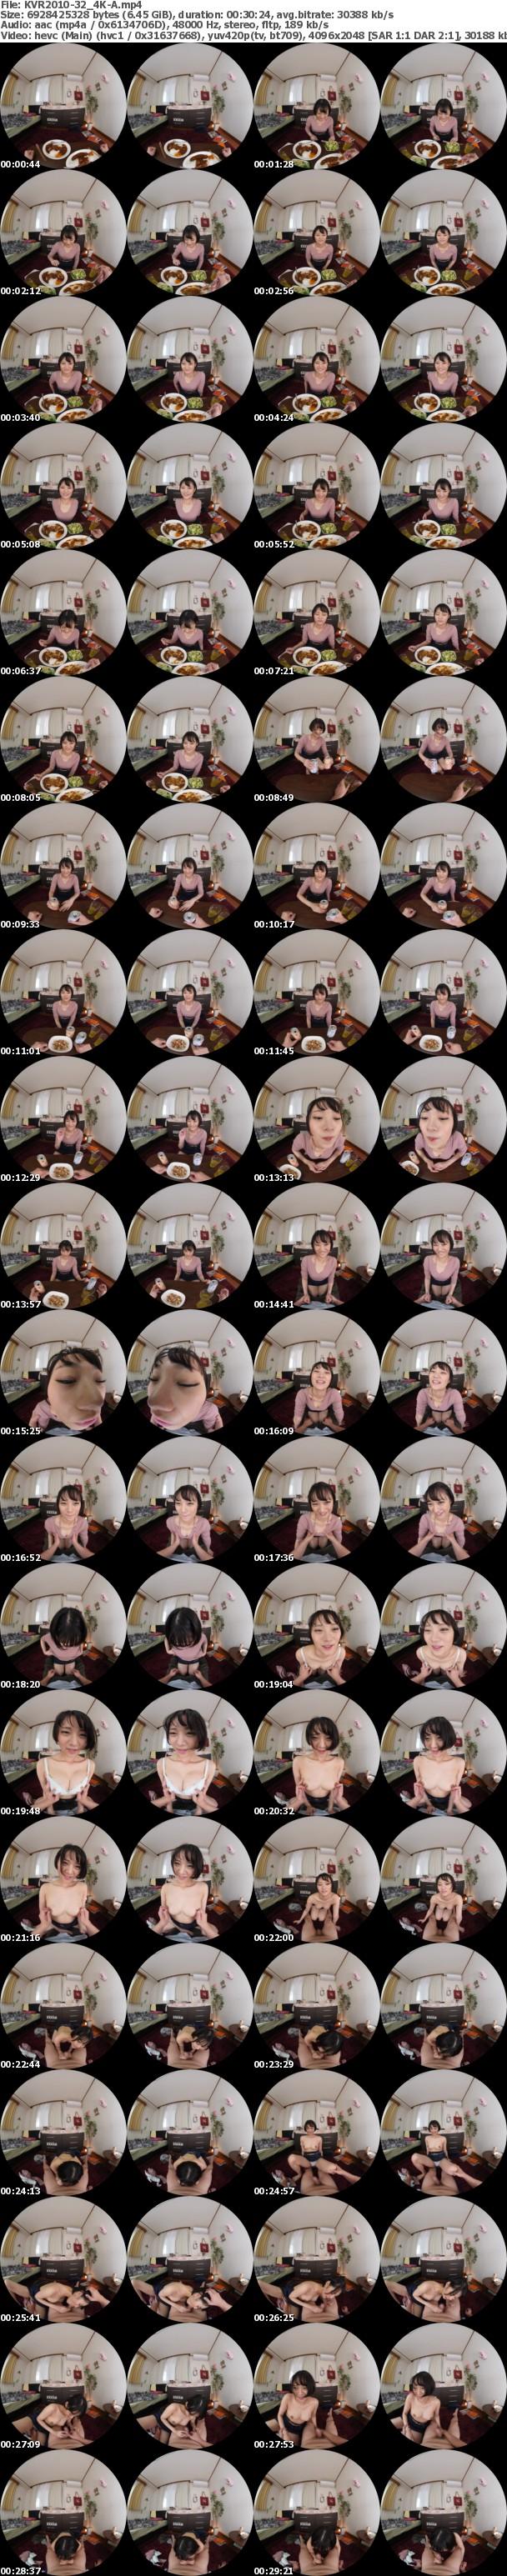 (VR) (4K) KVR2010-32 睾丸残弾数ZEROになるまで精子を求める絶倫彼女リノと生理2日前のスポコス性交